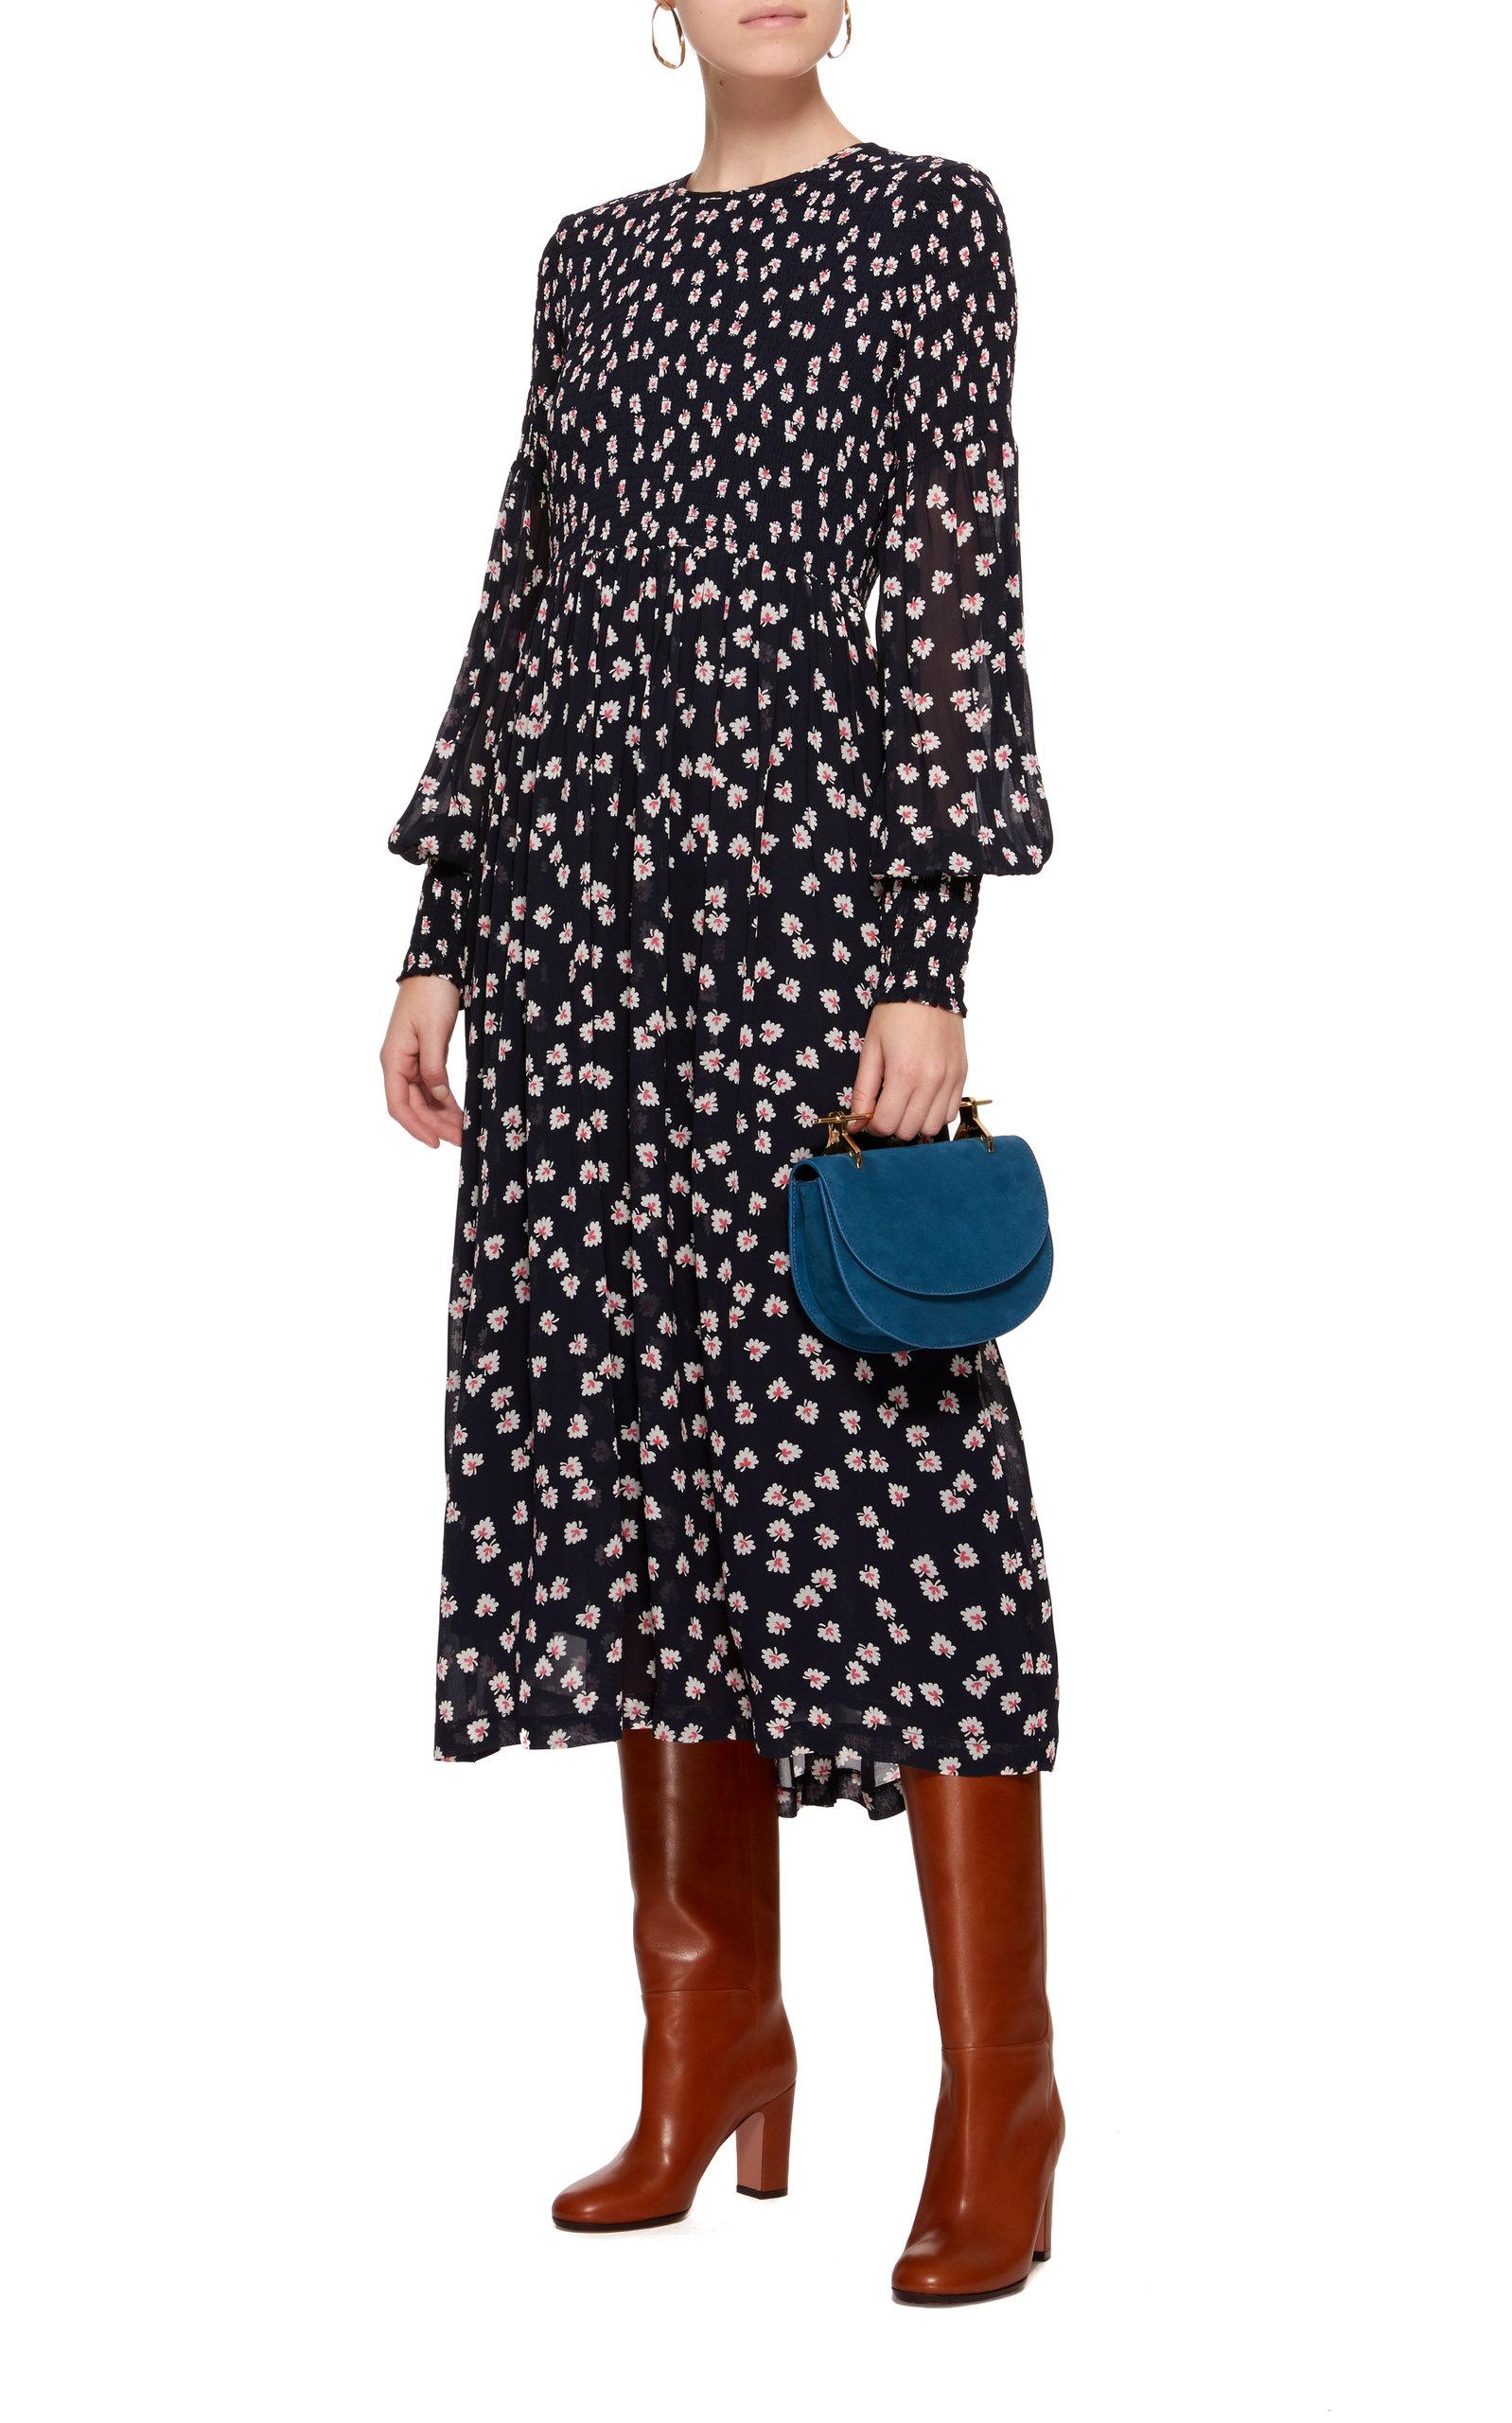 9efd0d61 GanniRometty Smocked Floral-Print Georgette Midi Dress. CLOSE. Loading